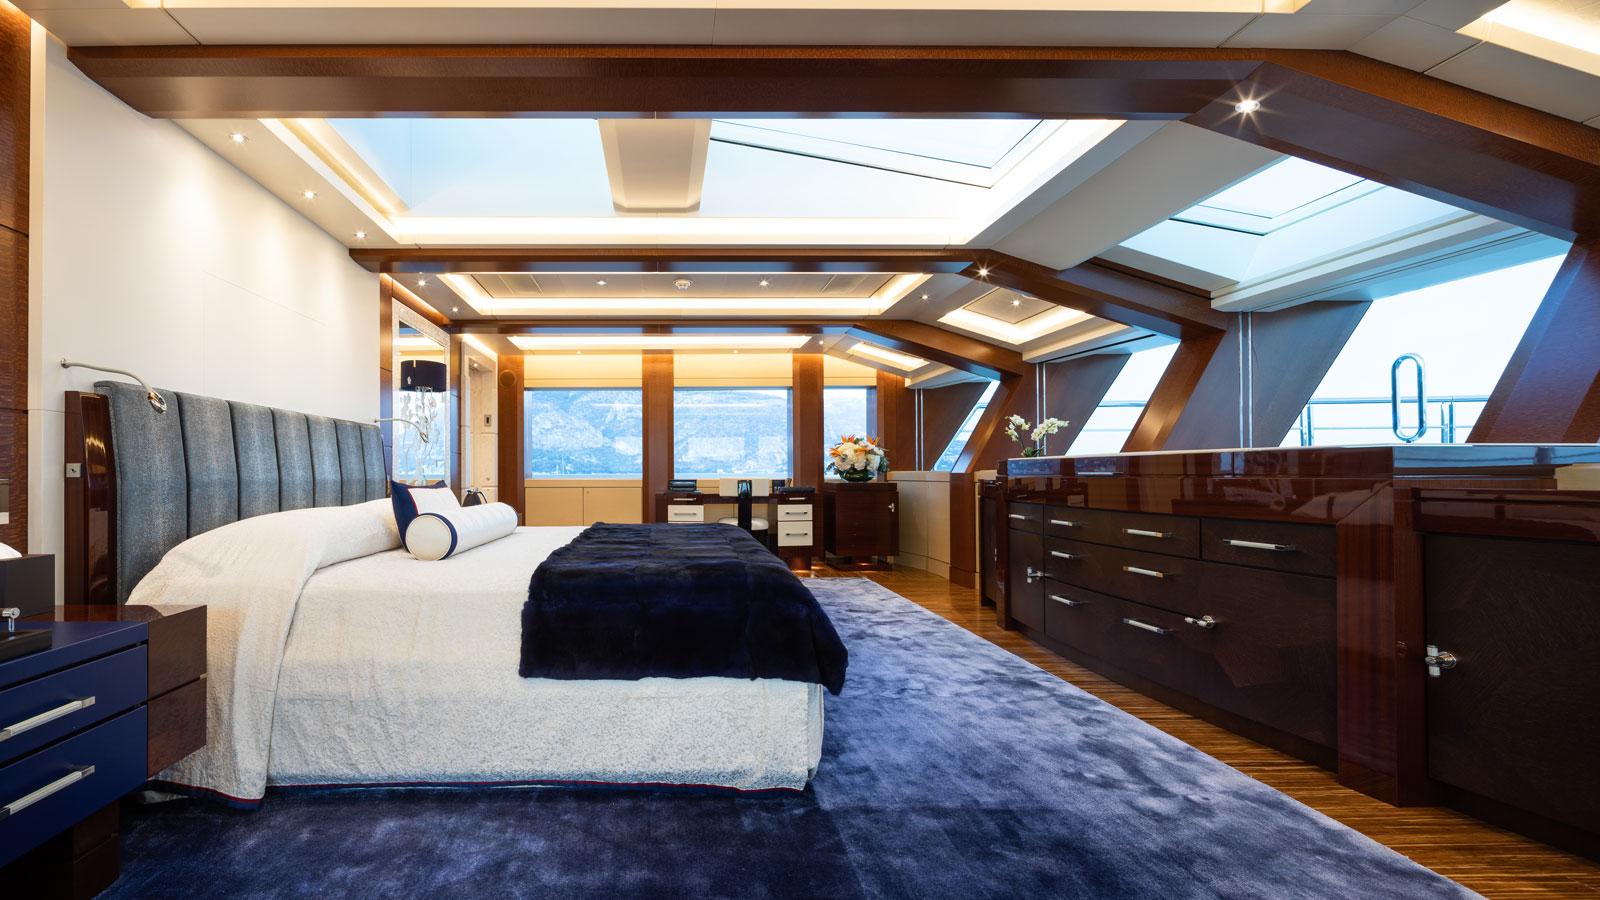 Tranquility-Oceanco-superyacht